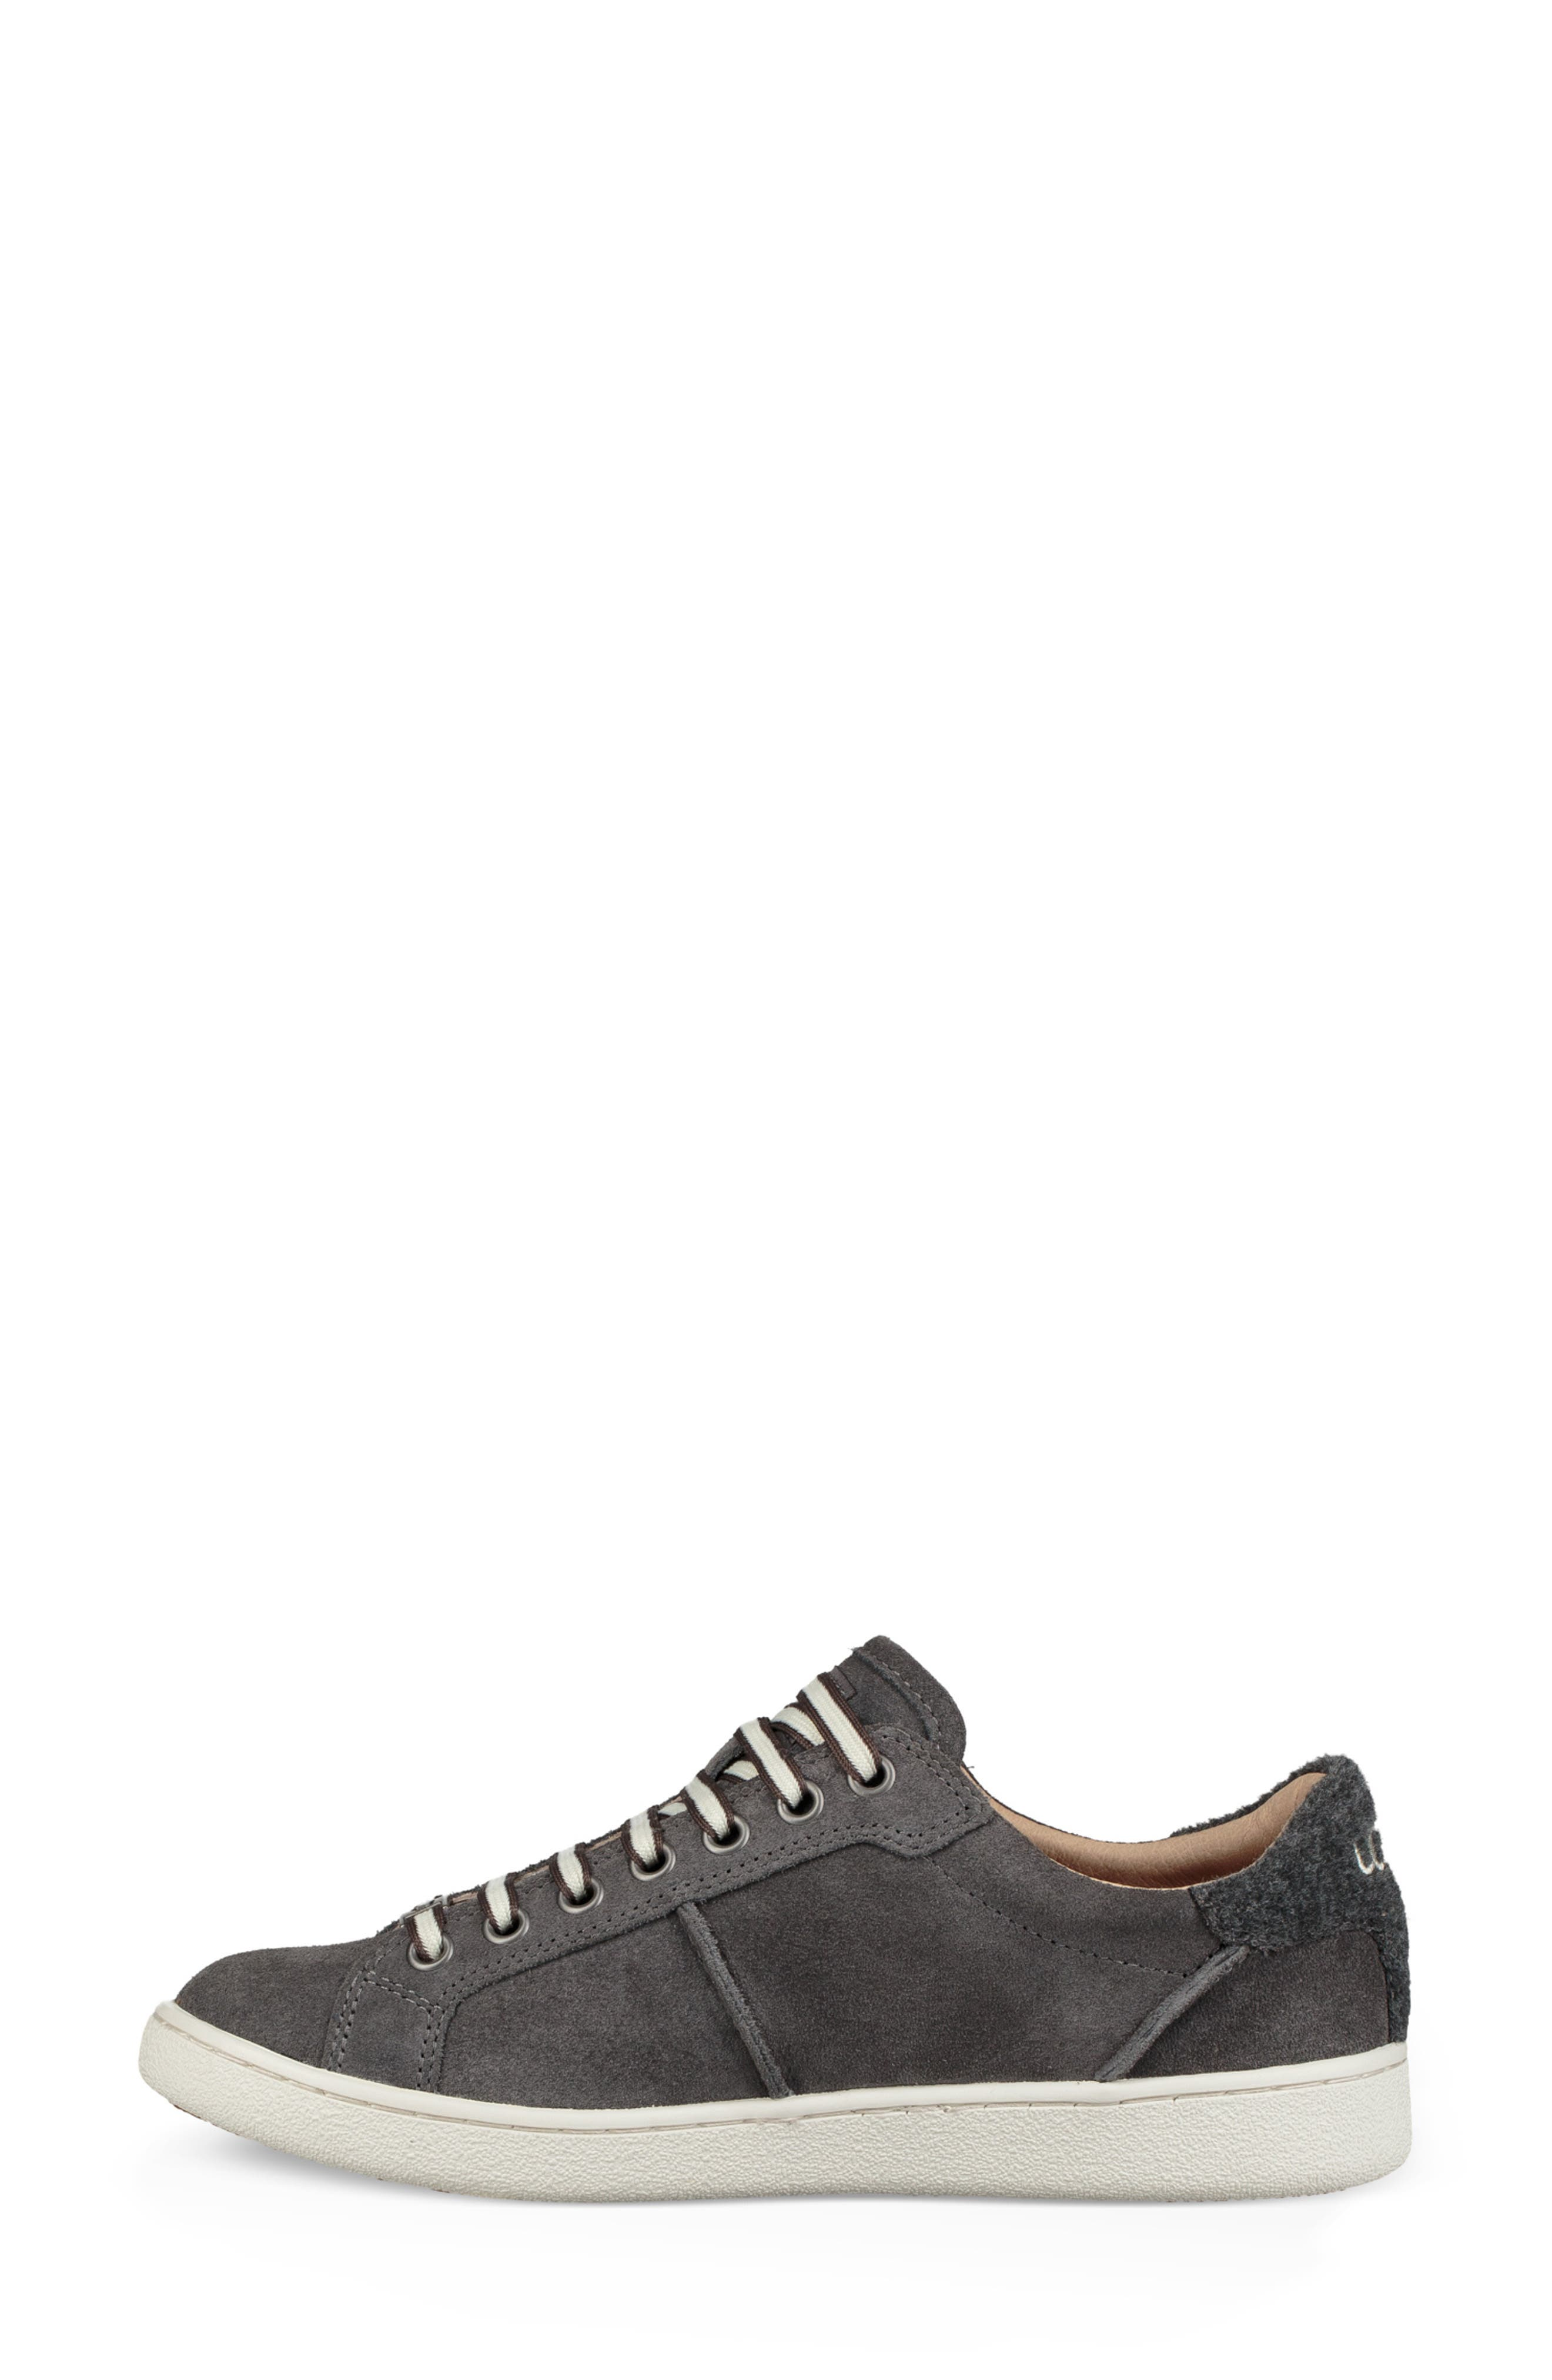 Milo Sneaker,                             Alternate thumbnail 6, color,                             CHARCOAL SUEDE